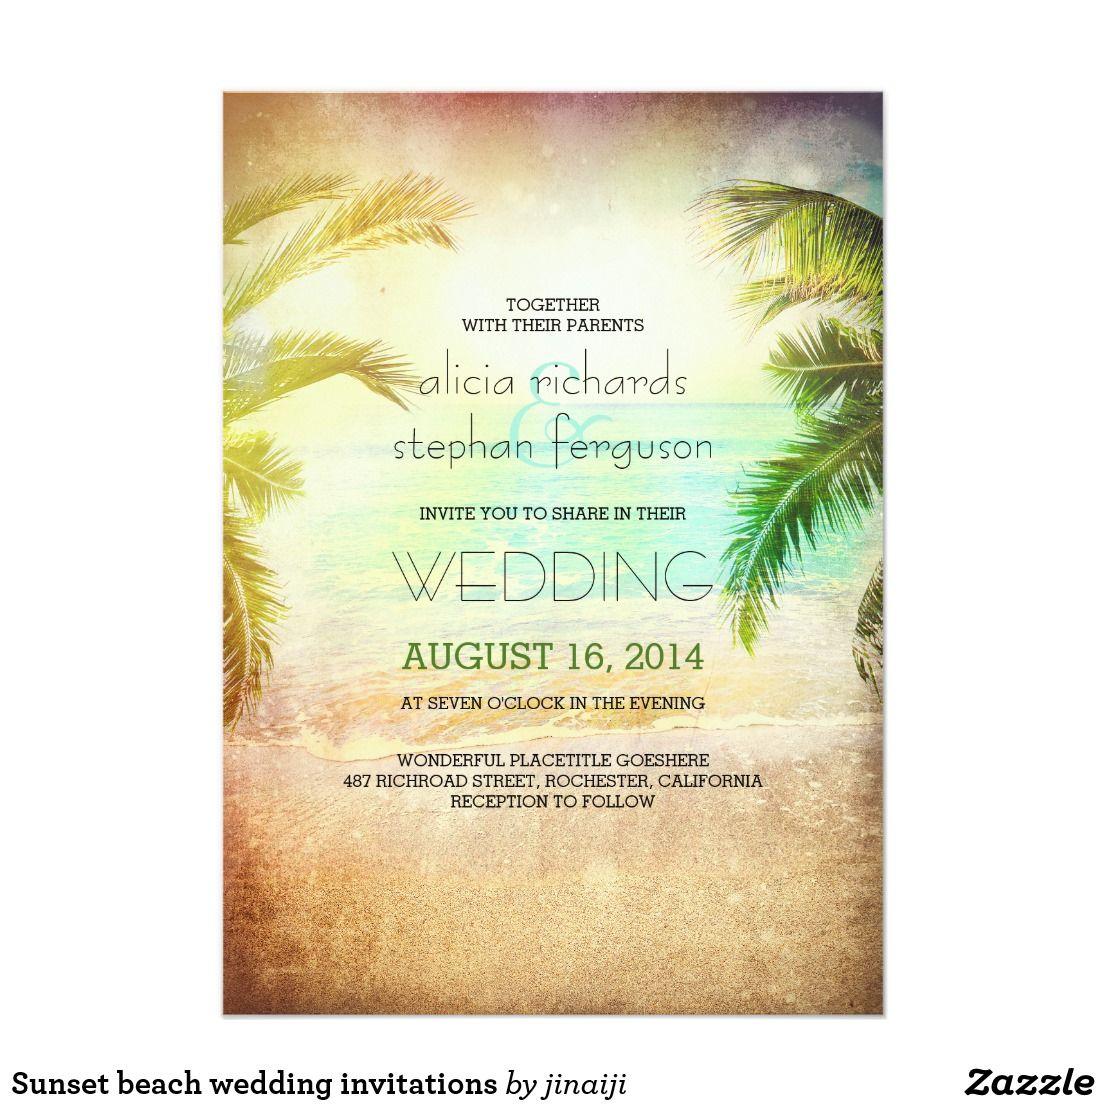 Sunset beach wedding invitations | Rustic Wedding Invitations ...